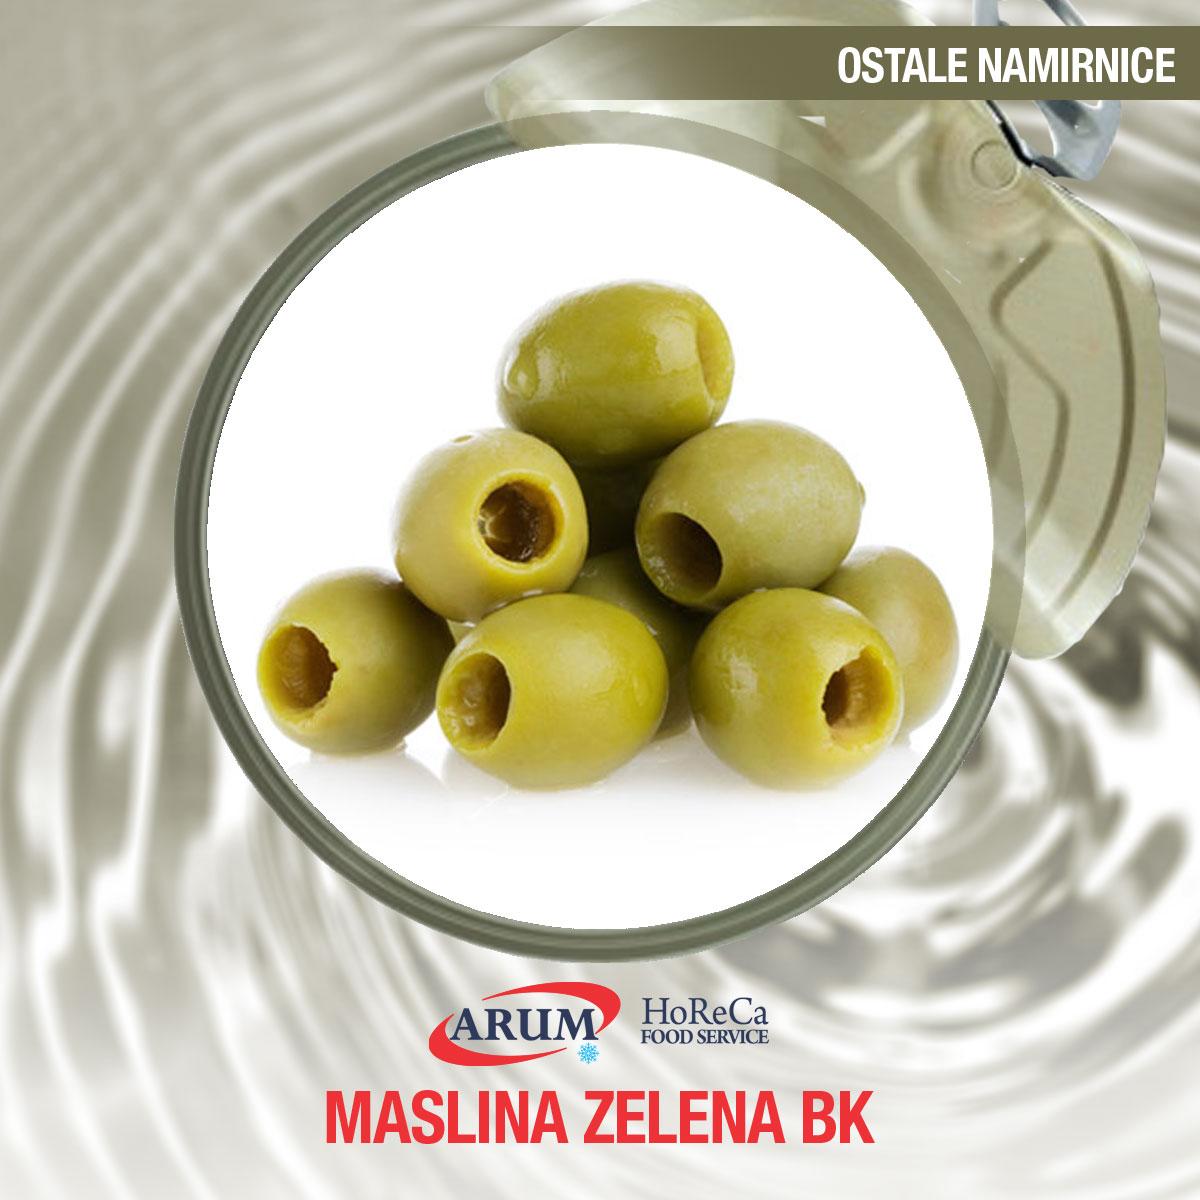 Maslina zelena b/k 3 kg